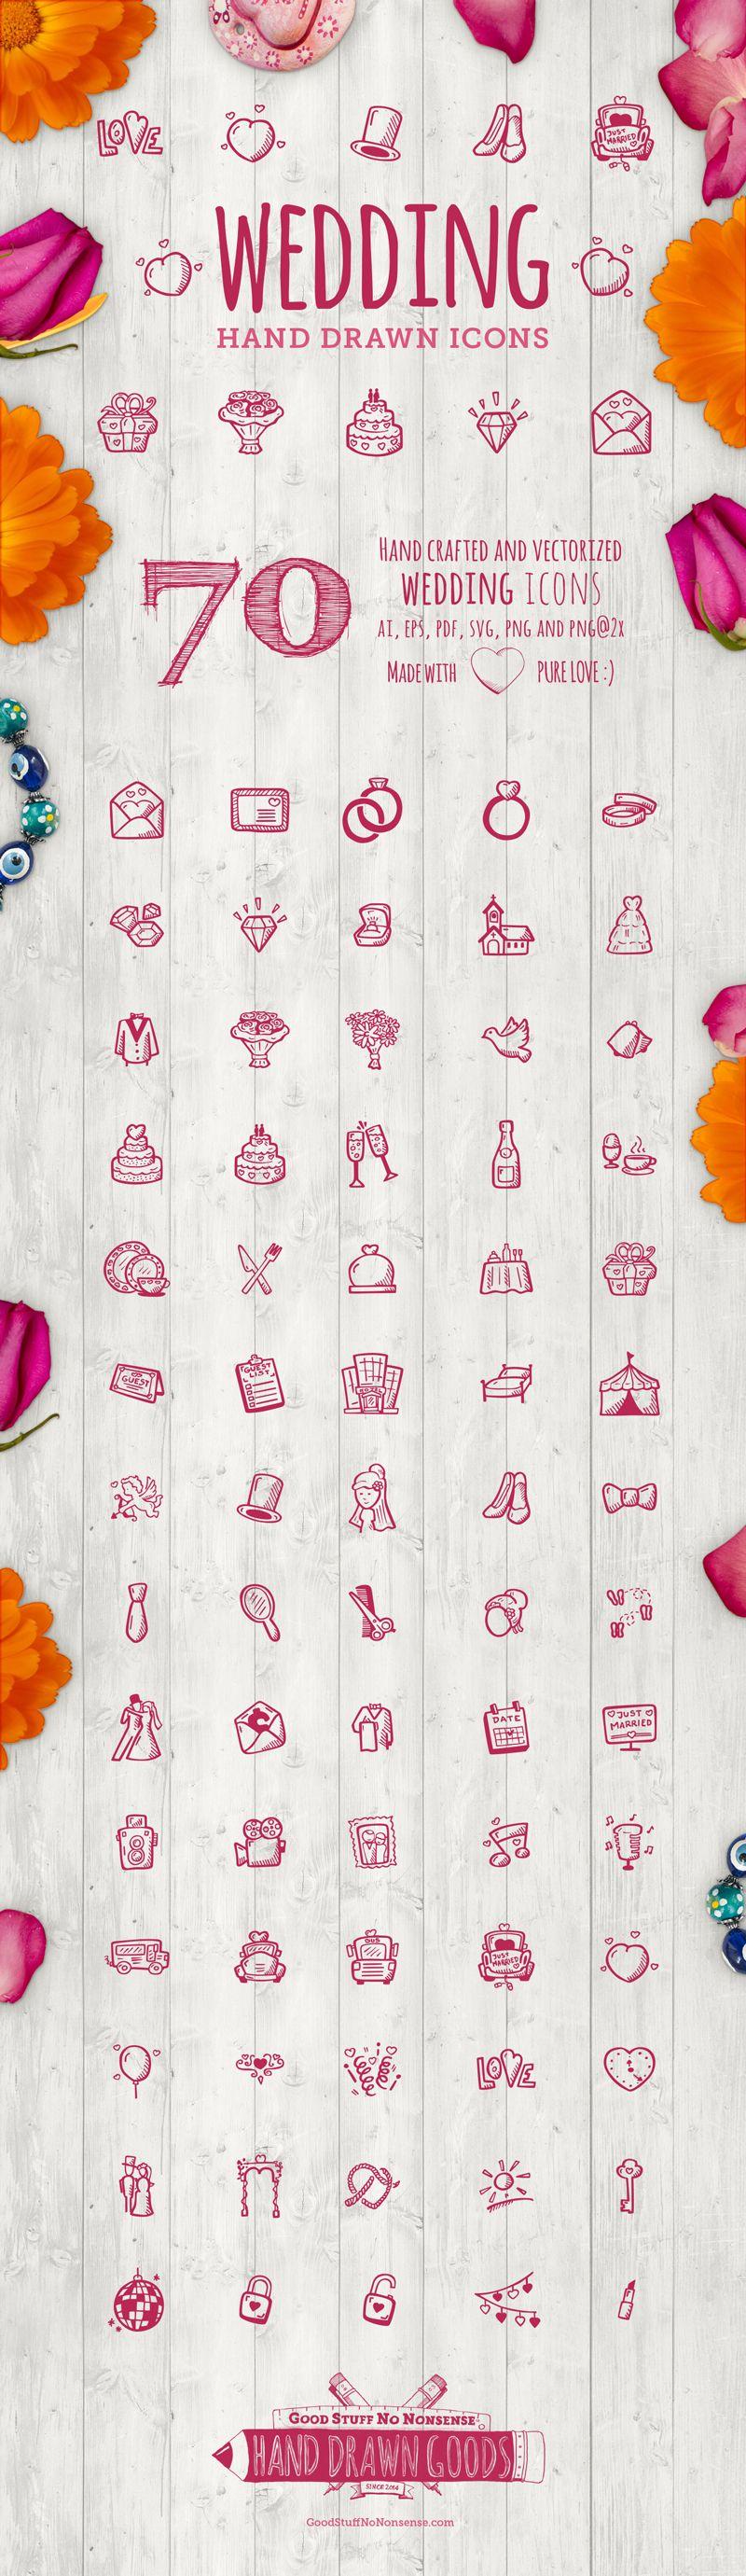 Wedding icons - Hand Drawn Icons